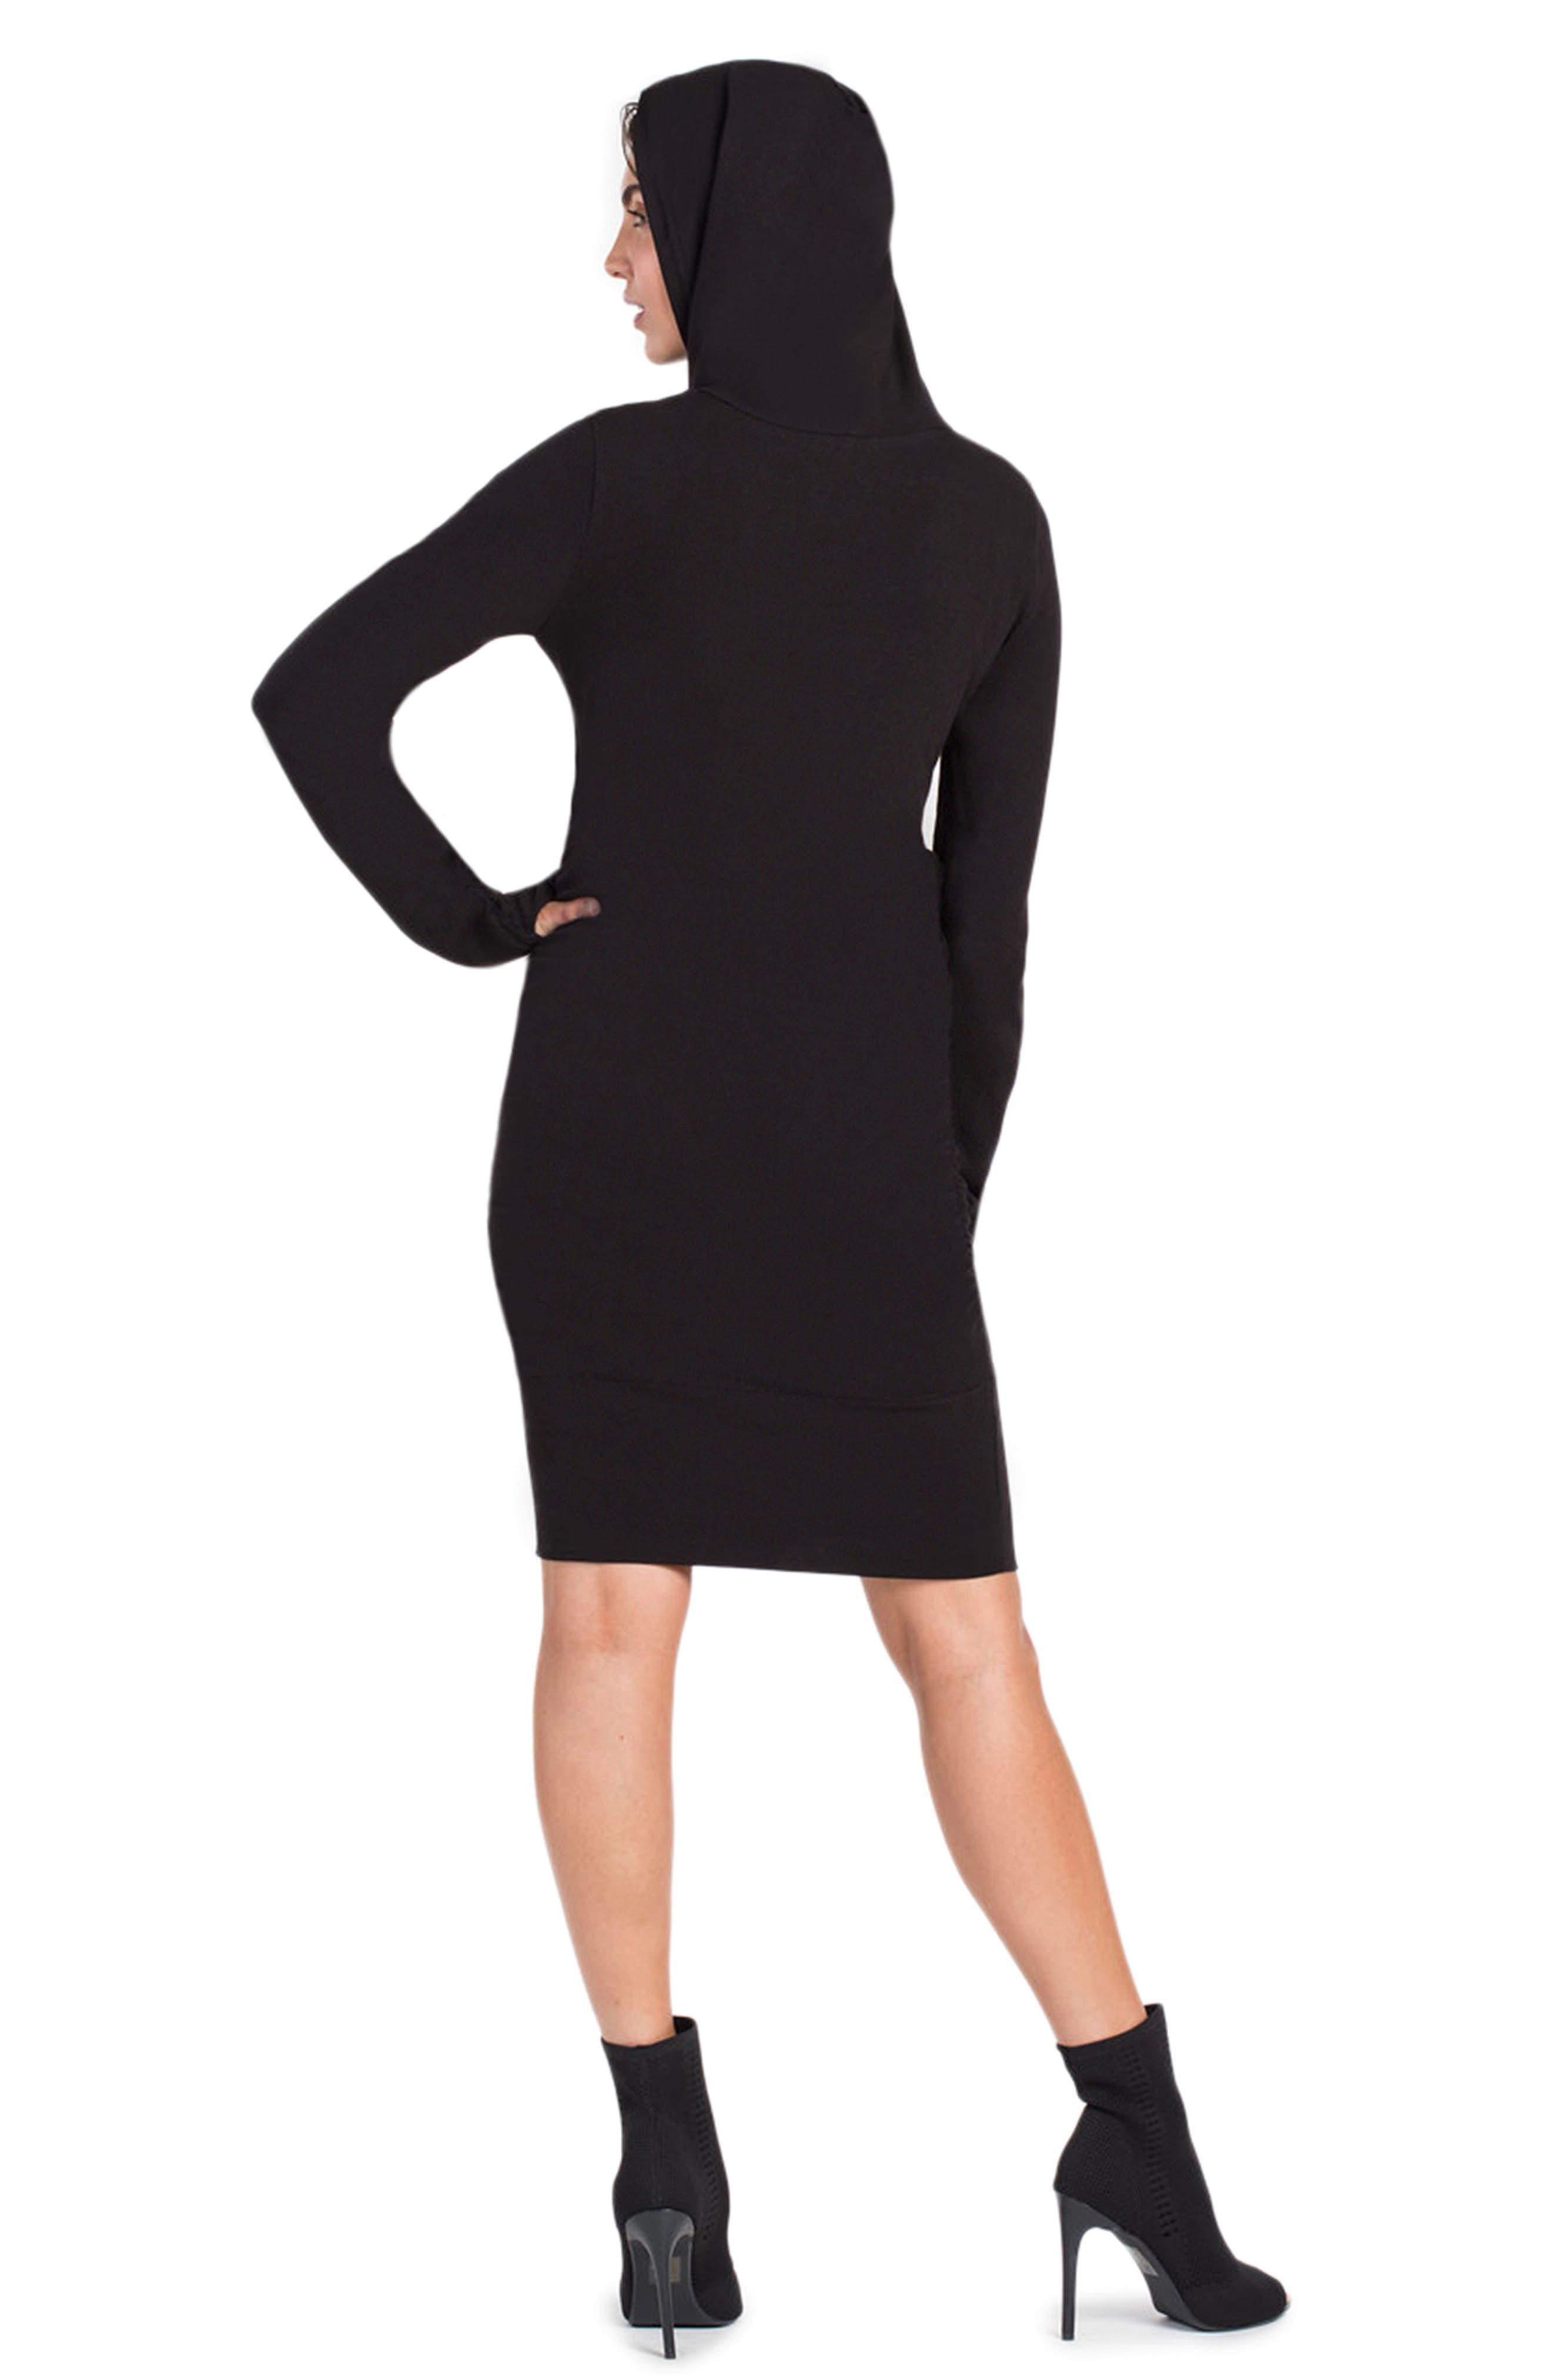 Stella Hoodie Maternity/Nursing Dress,                             Alternate thumbnail 2, color,                             BLACK